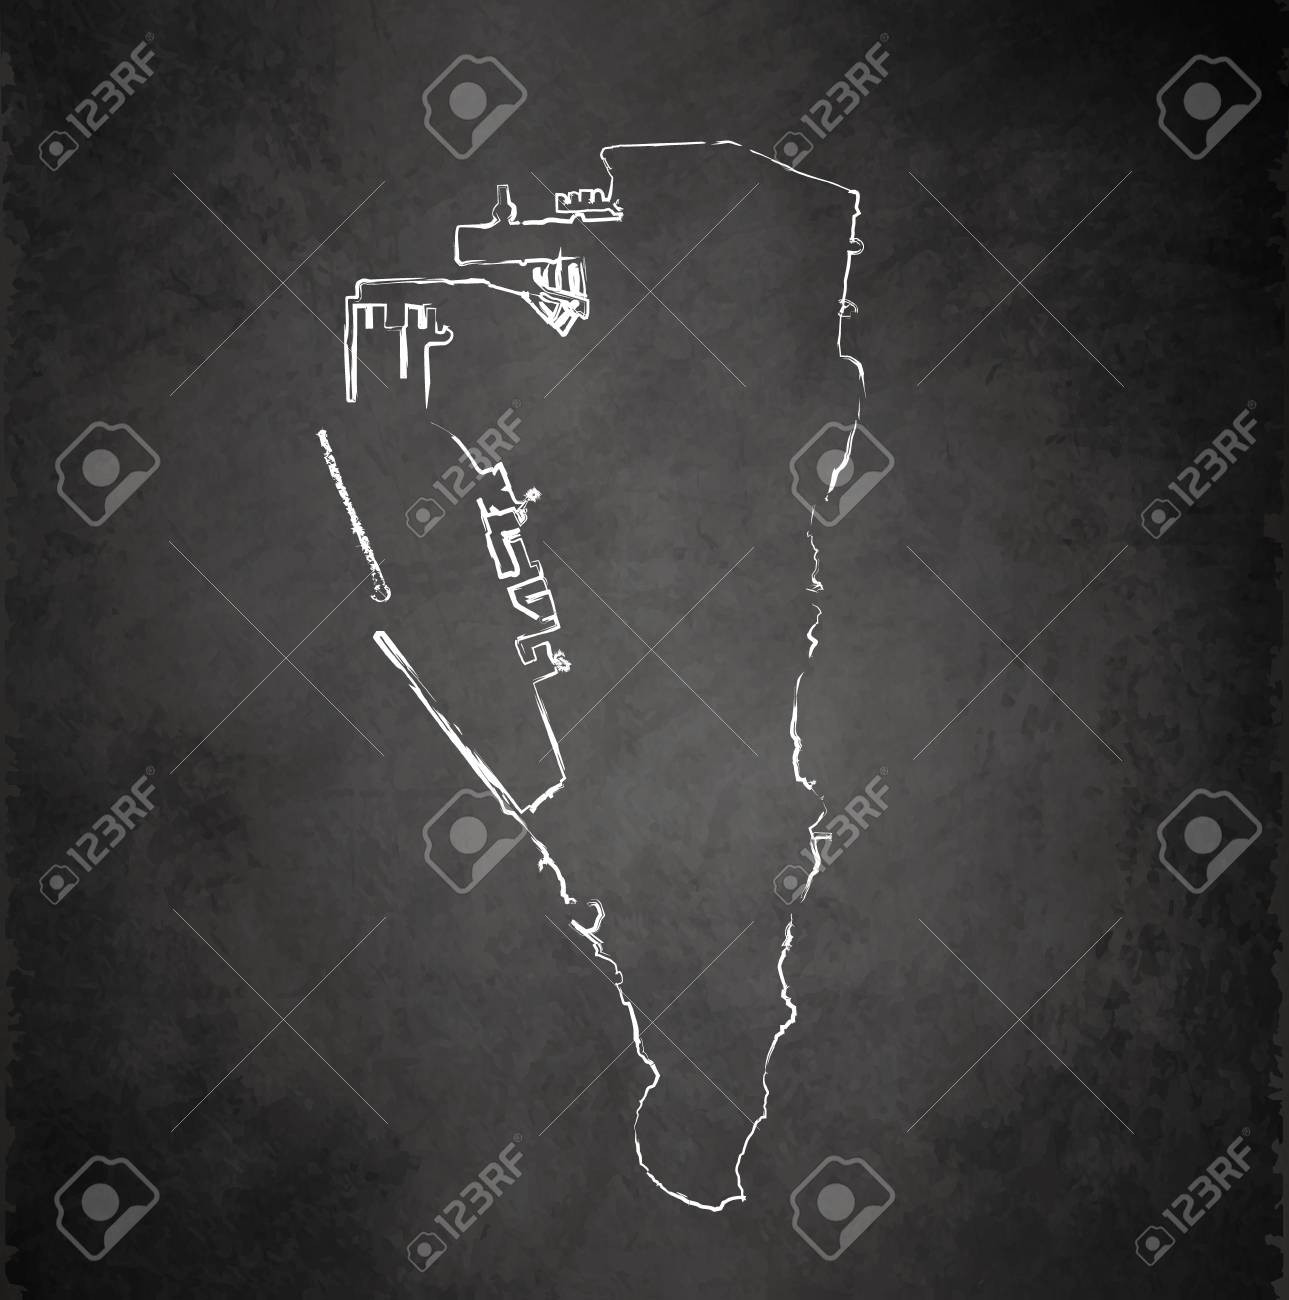 gibraltar maps blackboard chalkboard raster stock photo picture and